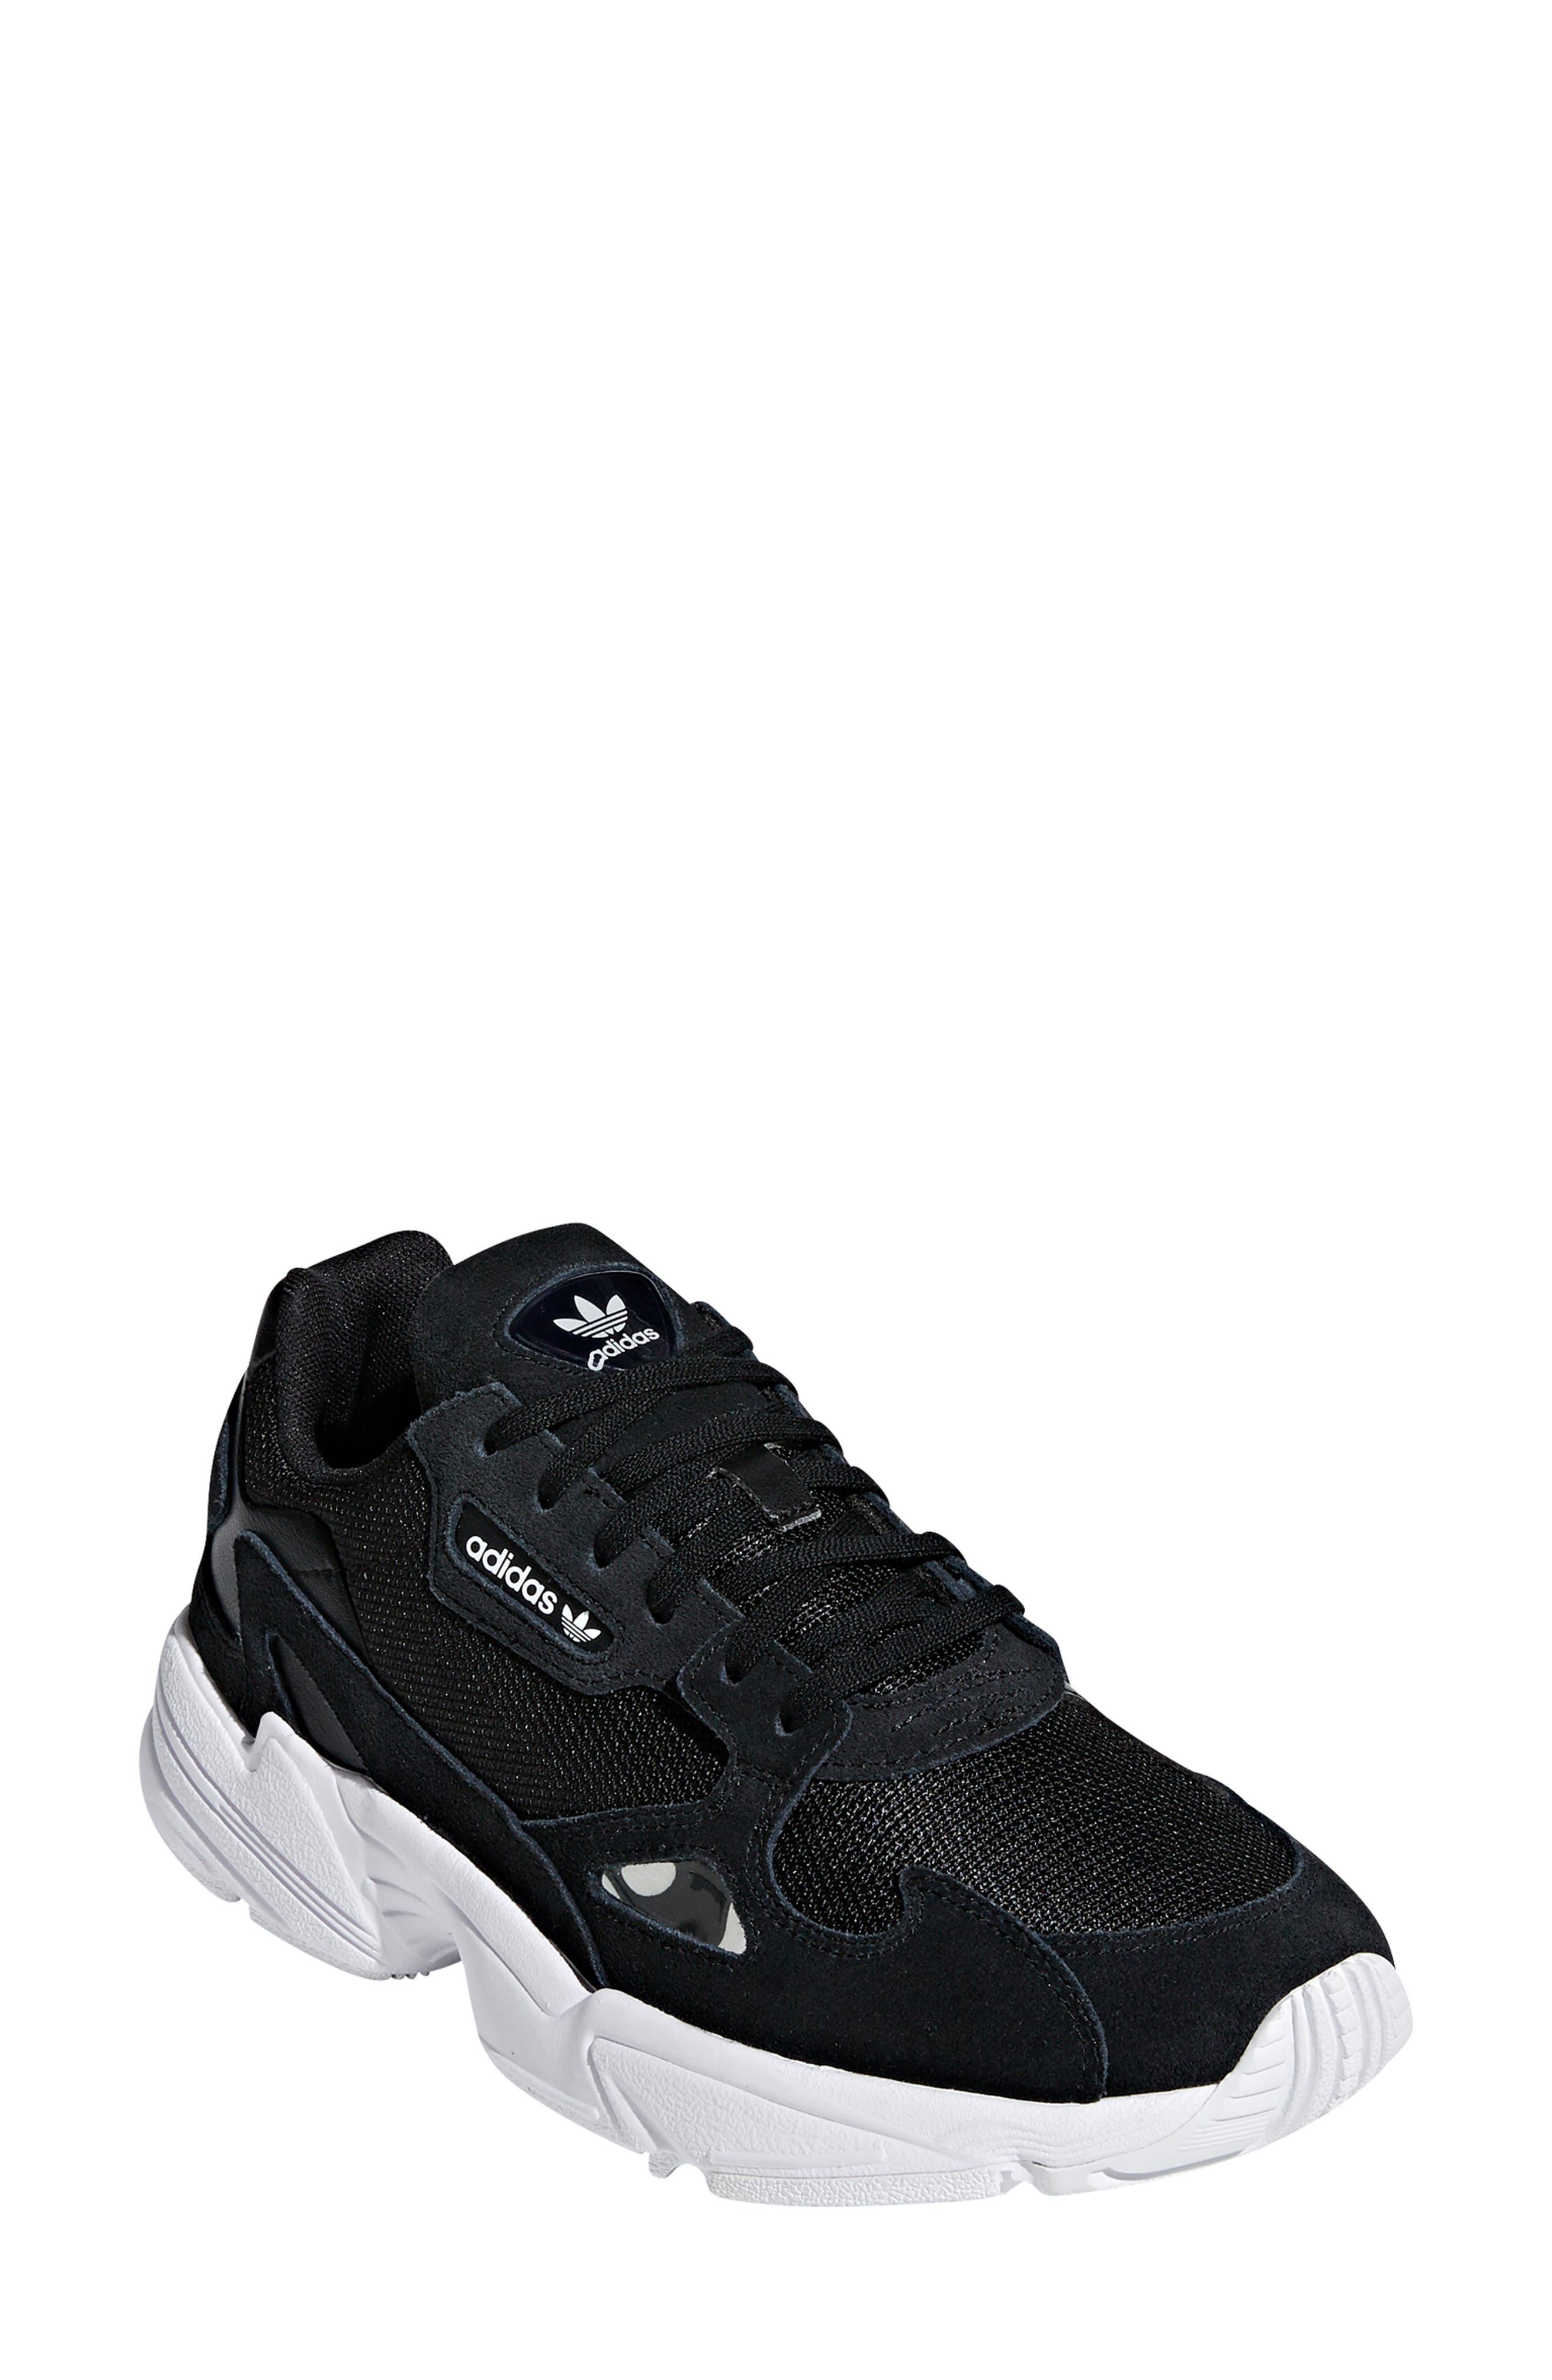 Adidas Falcon Sneaker, Black